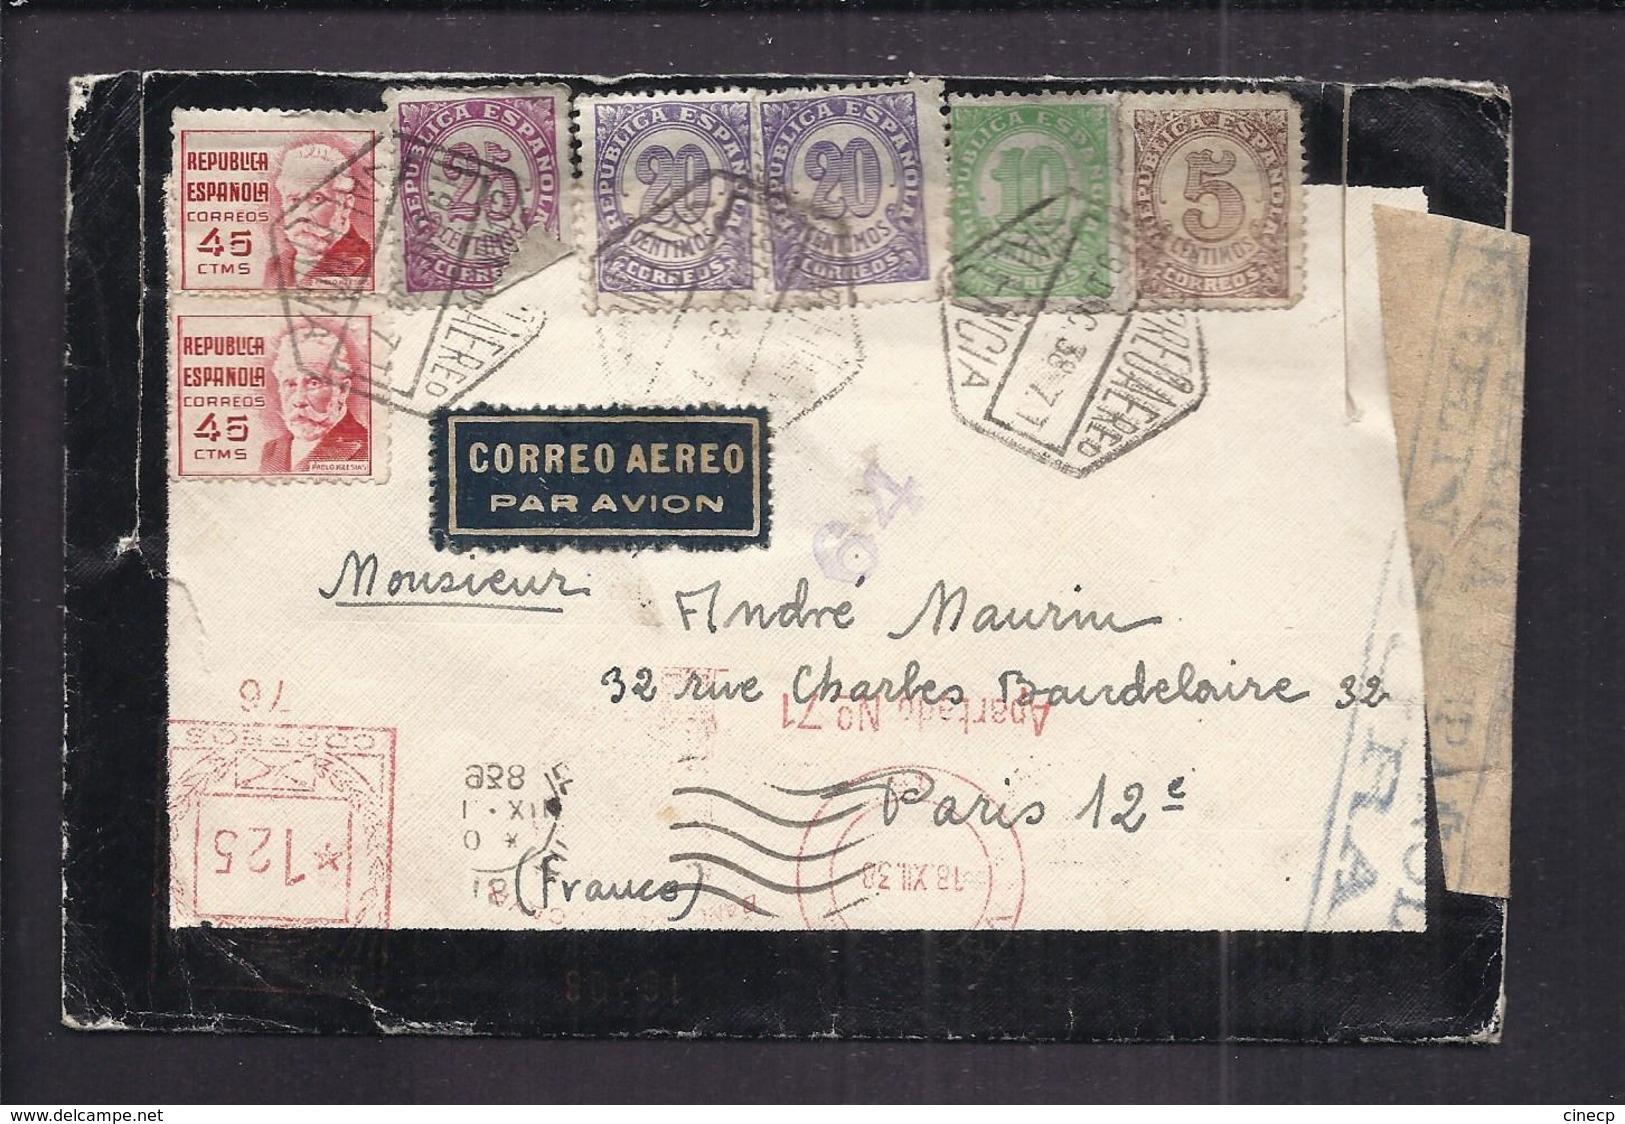 ENVELOPPE GUERRE ESPAGNE 1938 Cachet De Censure REPUBLICA ESPANOLA VALENCIA CORREO AEREO AEROGRAMME - Bolli Di Censura Repubblicana